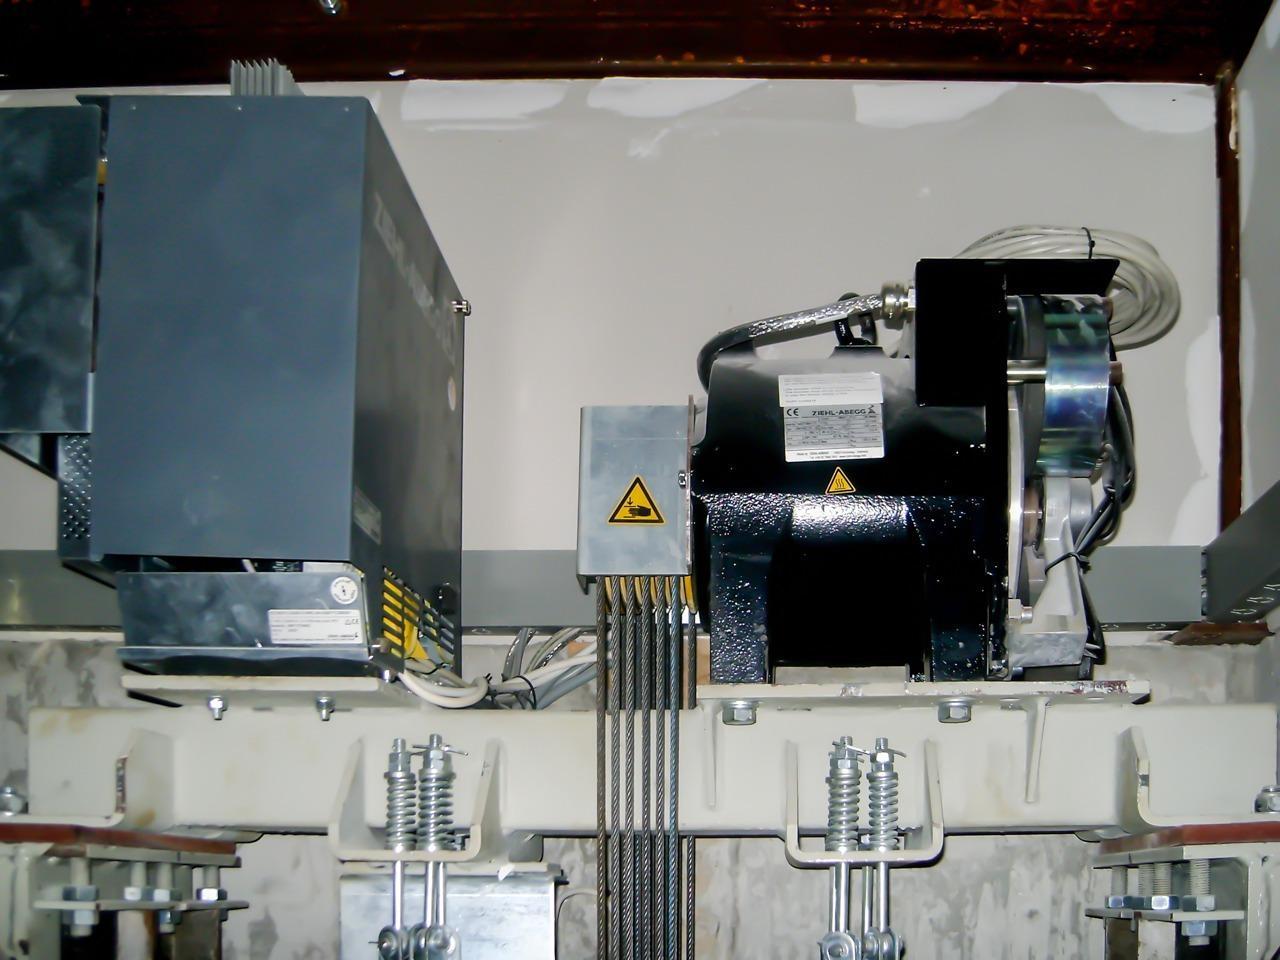 zlift-erga-lifts-25 Εγκατάσταση Ανελκυστήρα - Ρόδος